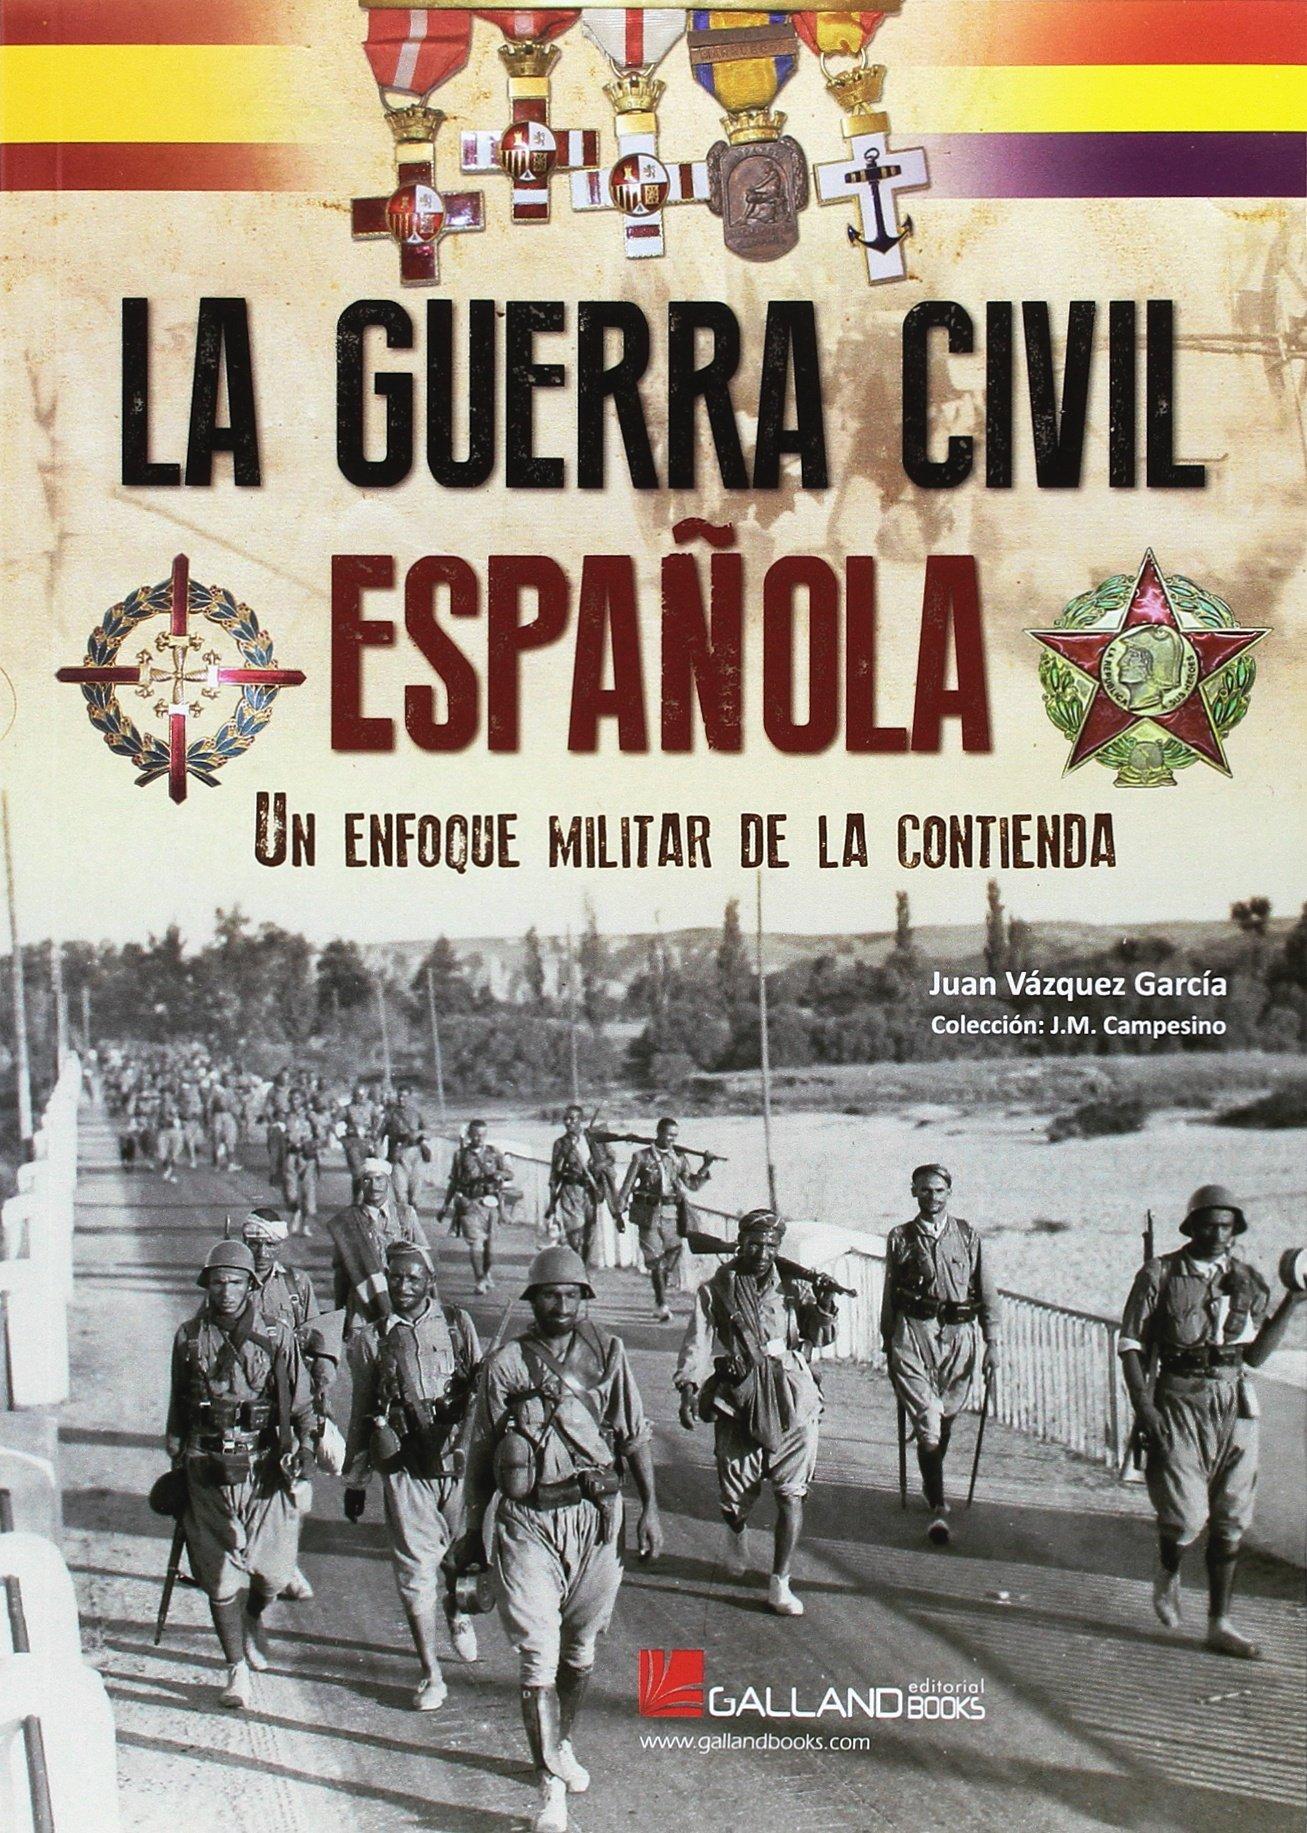 La Guerra Civil Española: Amazon.es: Vázquez García, Juan: Libros